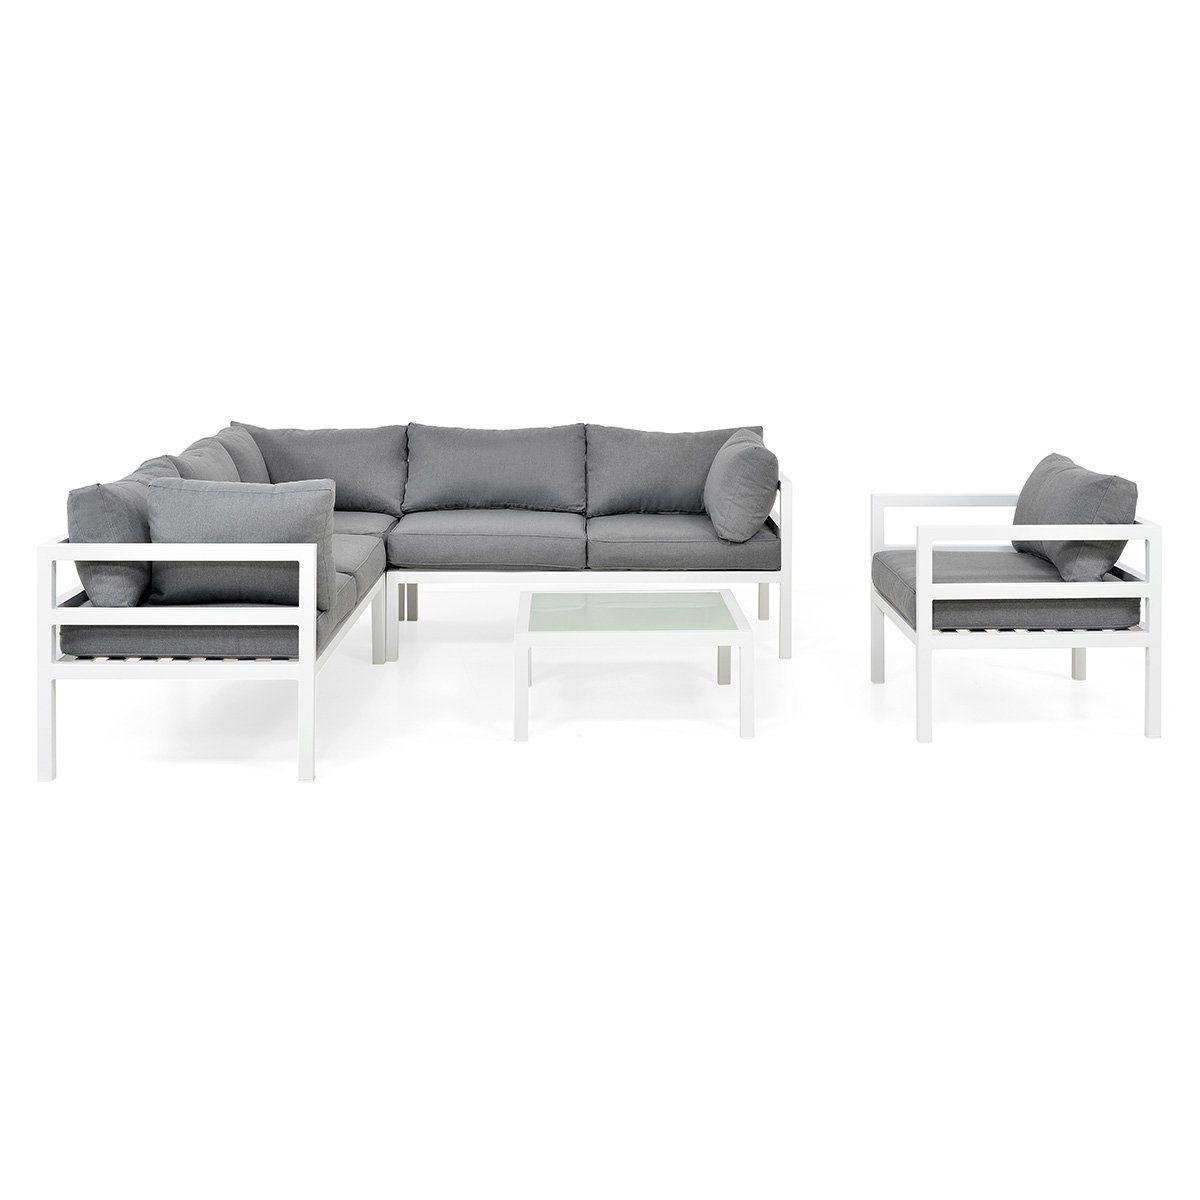 Madrid Set Mobilier Gradina Terasa 1 Fotoliu Masuta Coltar 4 Locuri In 2020 Sectional Couch Home Decor Furniture